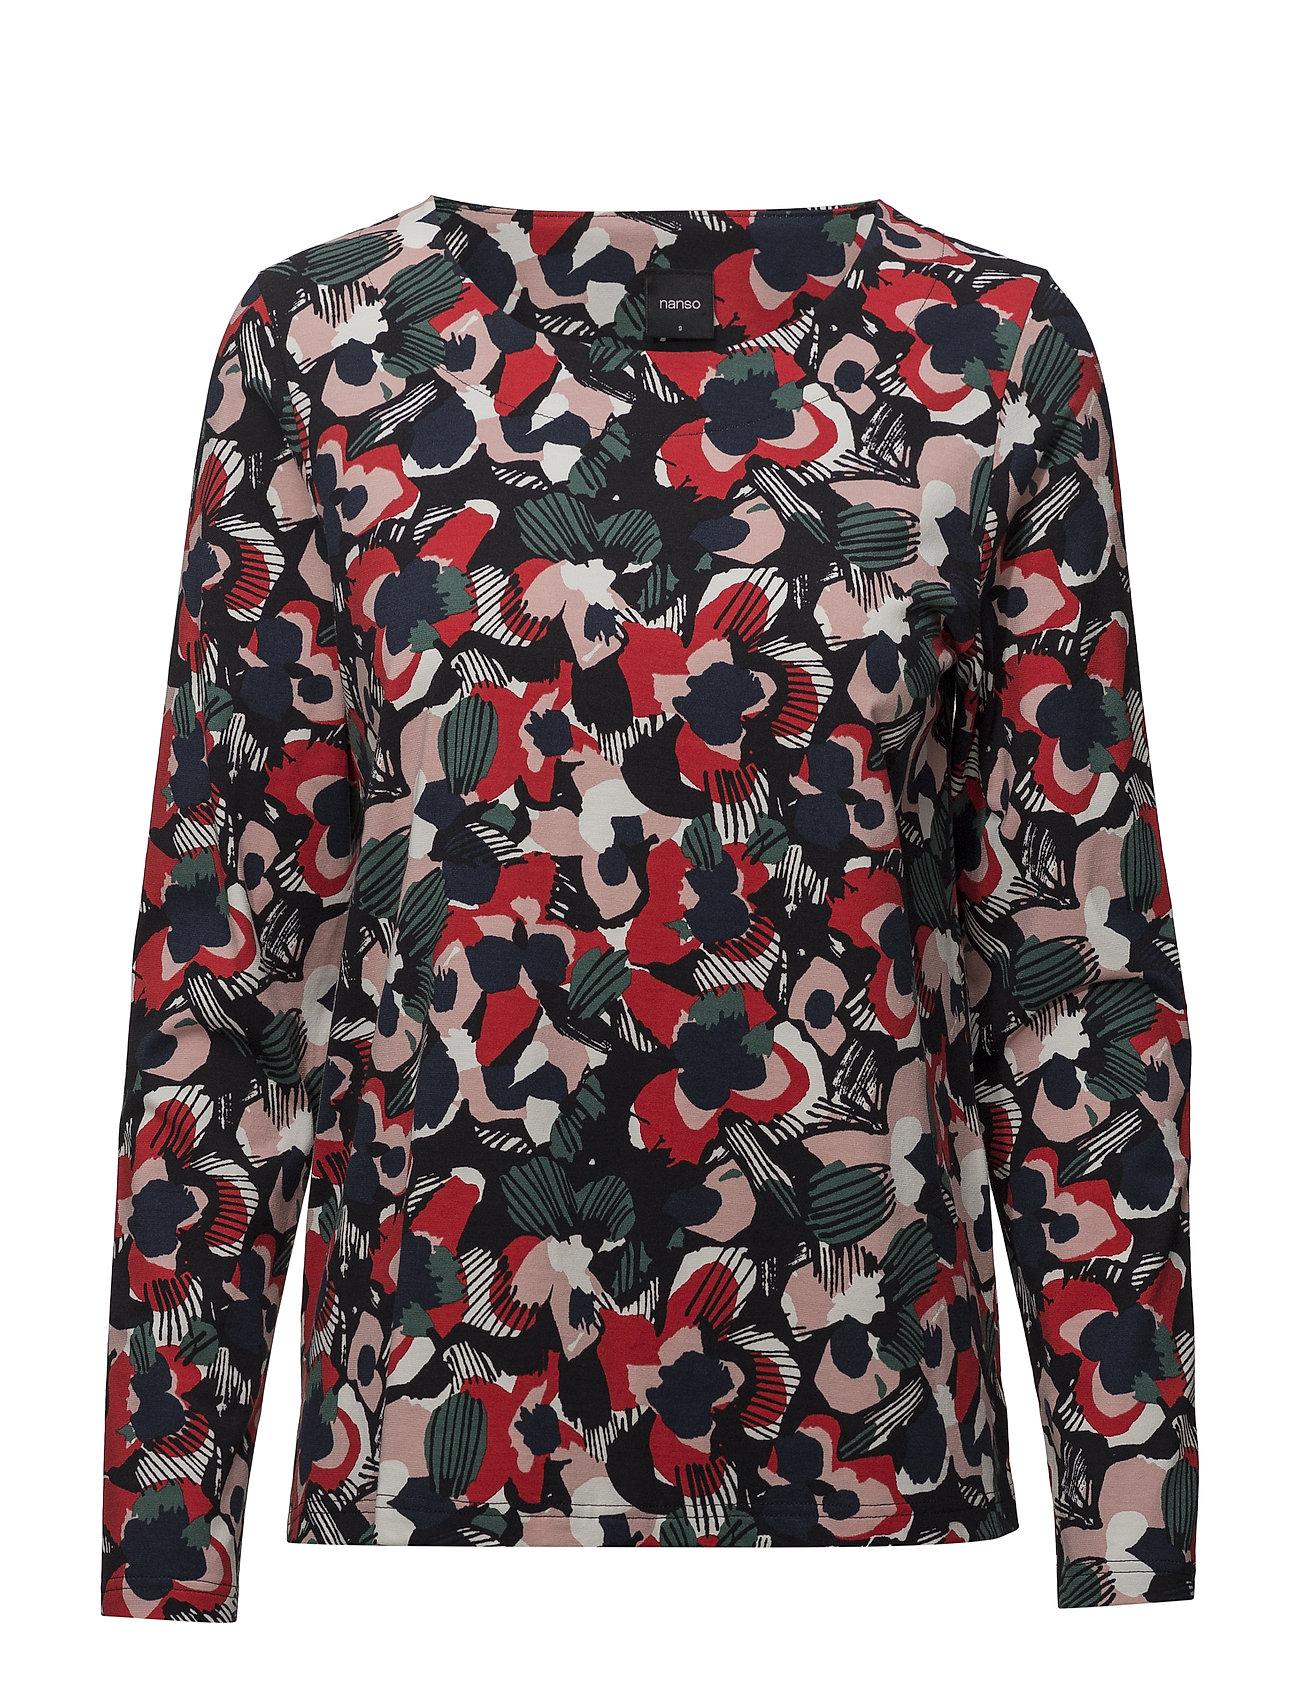 Nanso Ladies shirt, Leimu - MULTICOLOR